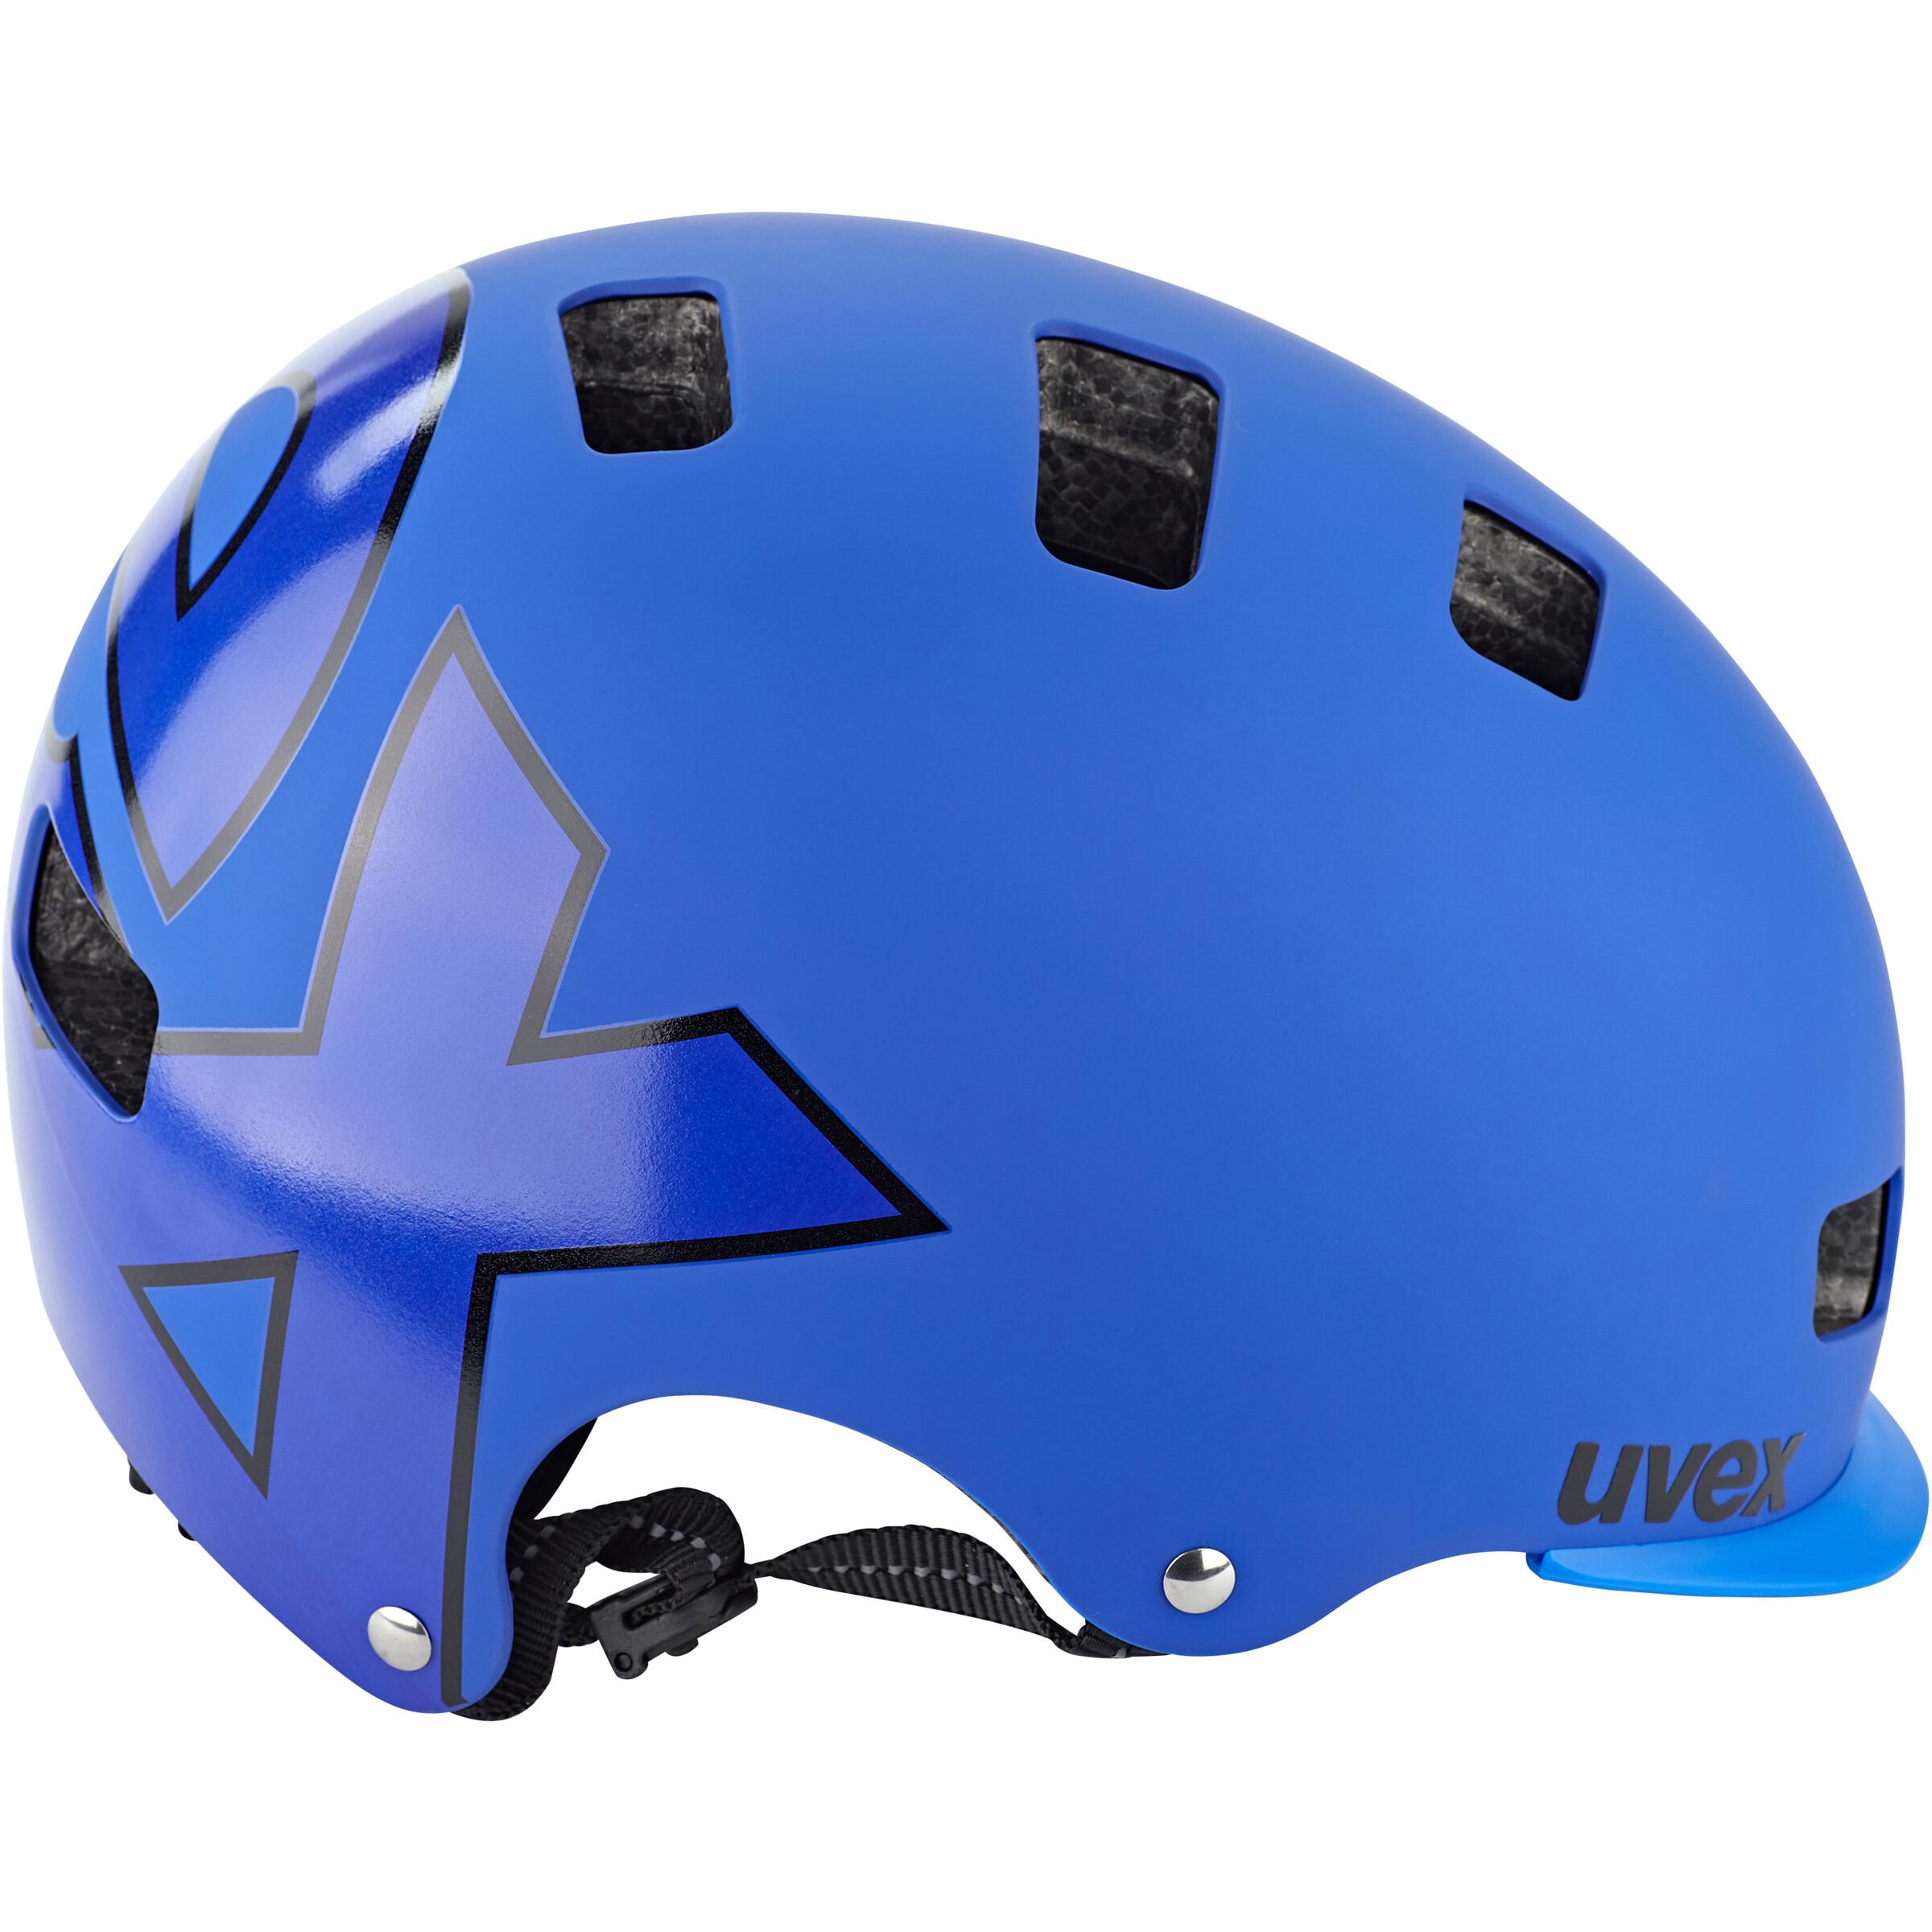 UVEX HLMT 5 PRO, BLUE MAT 2016 58-62 cm